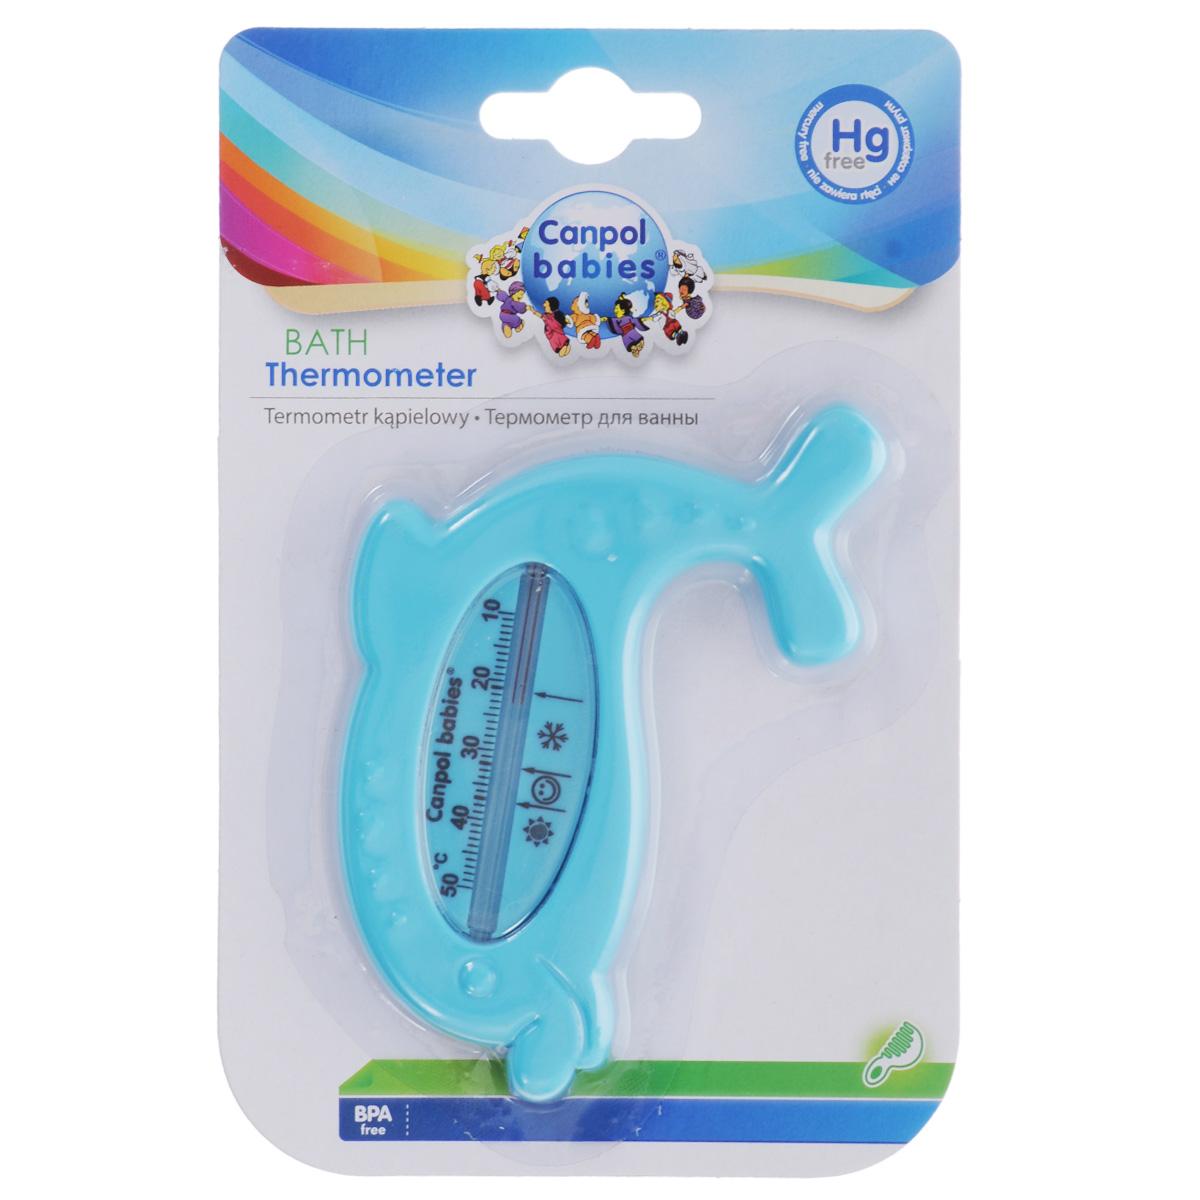 Canpol Babies Термометр для ванны цвет голубой